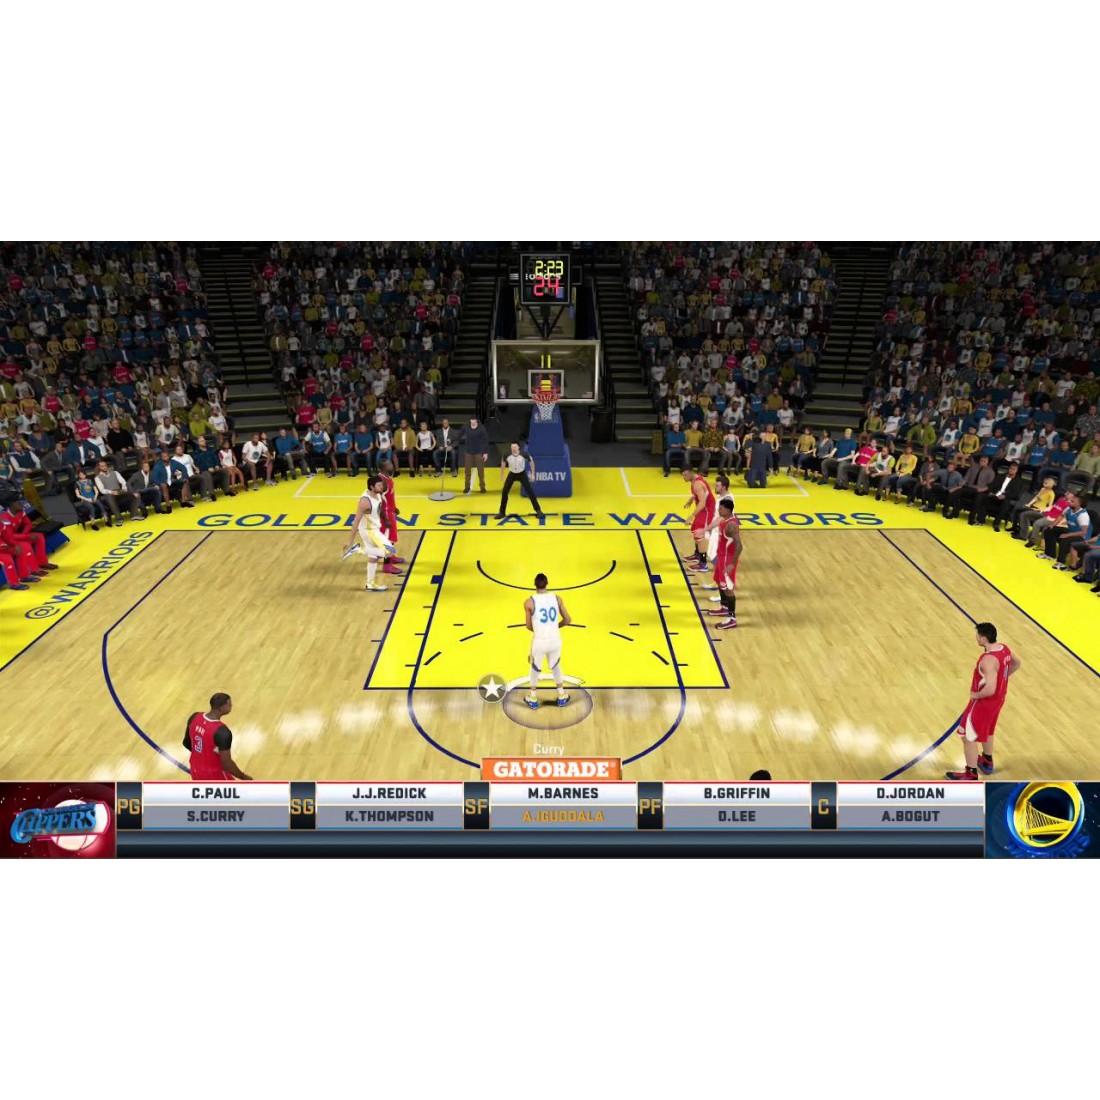 NBA 2K15 (Xbox One)-DIVIXIA ELECTRONICS  Nba 2k14 Graphics Comparison